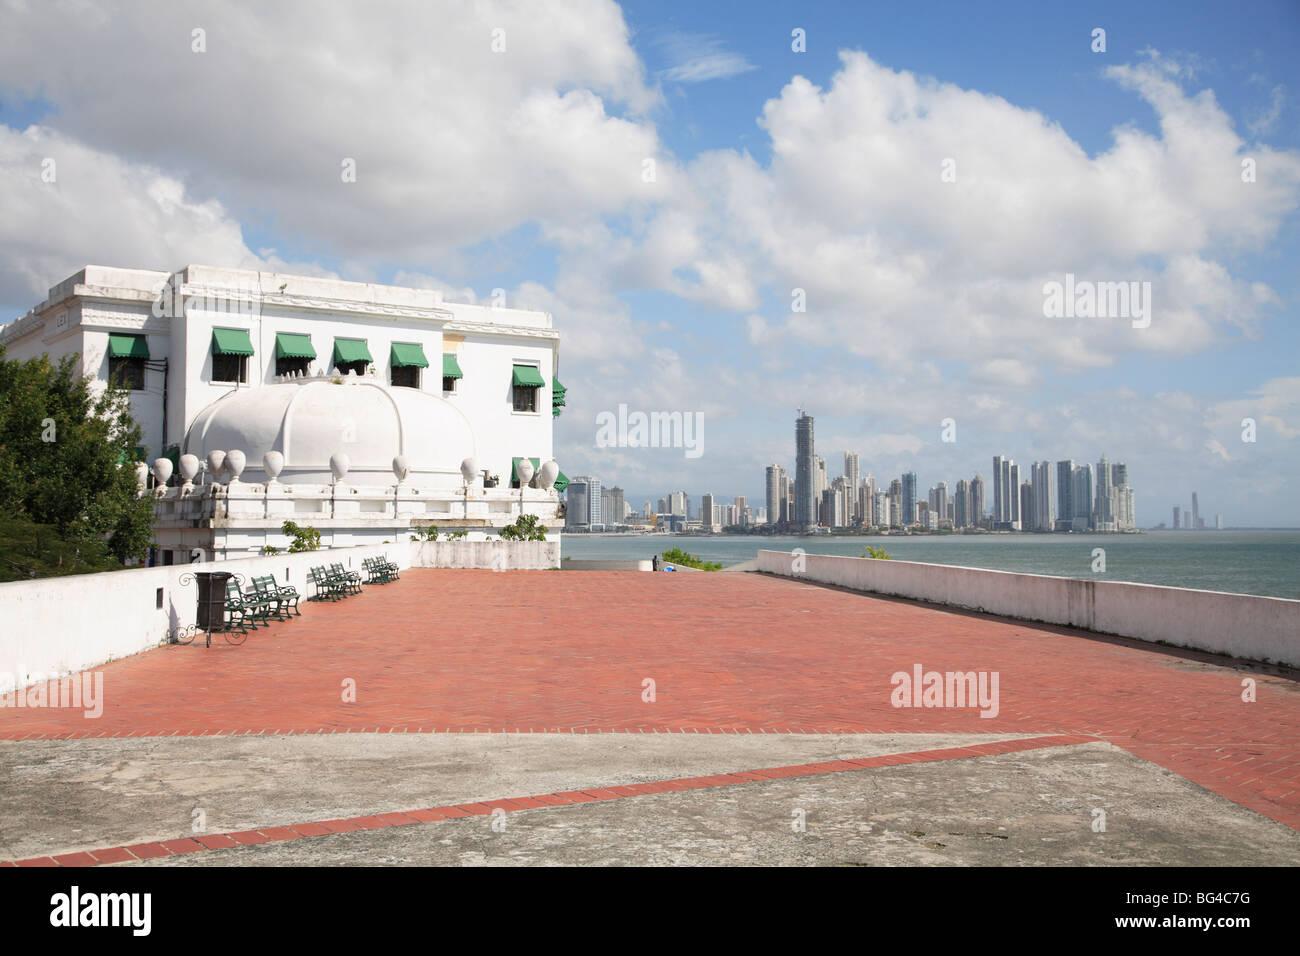 Paseo General Esteban Huertas, Casco Viejo, San Felipe distretto, Panama City, Panama Bay, Panama America Centrale Immagini Stock